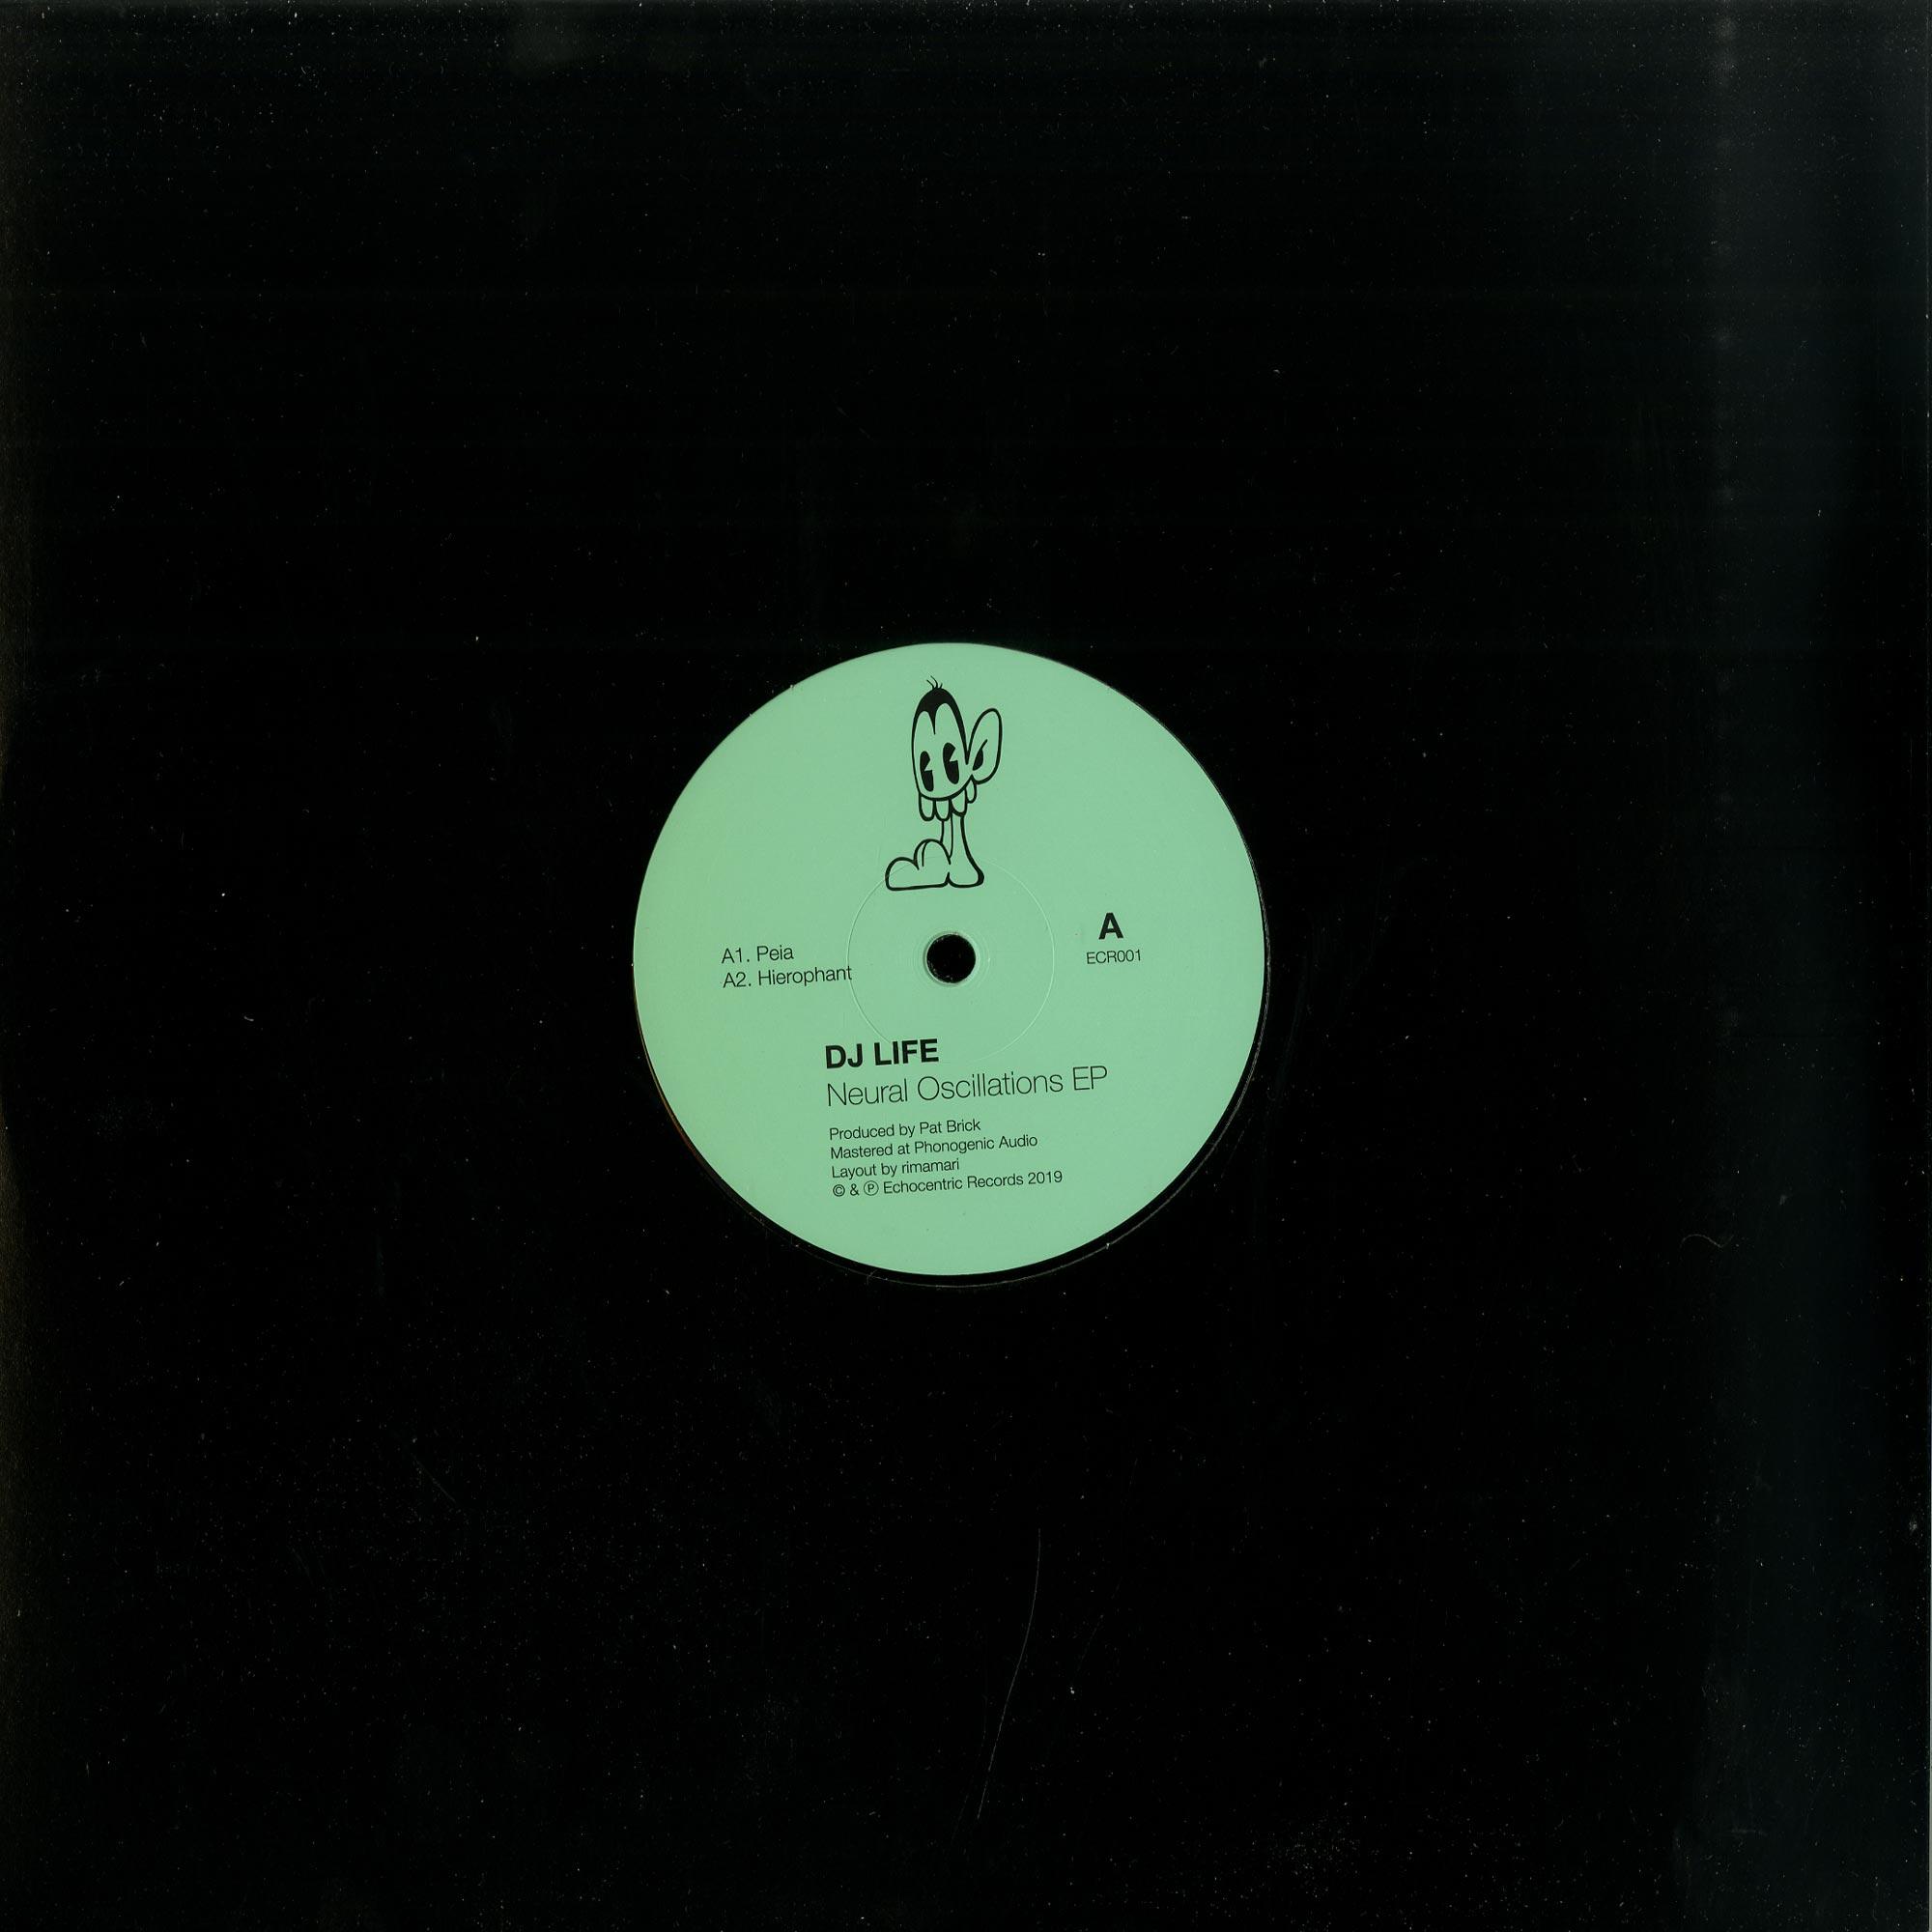 DJ Life - NEURAL OSCILLATIONS EP